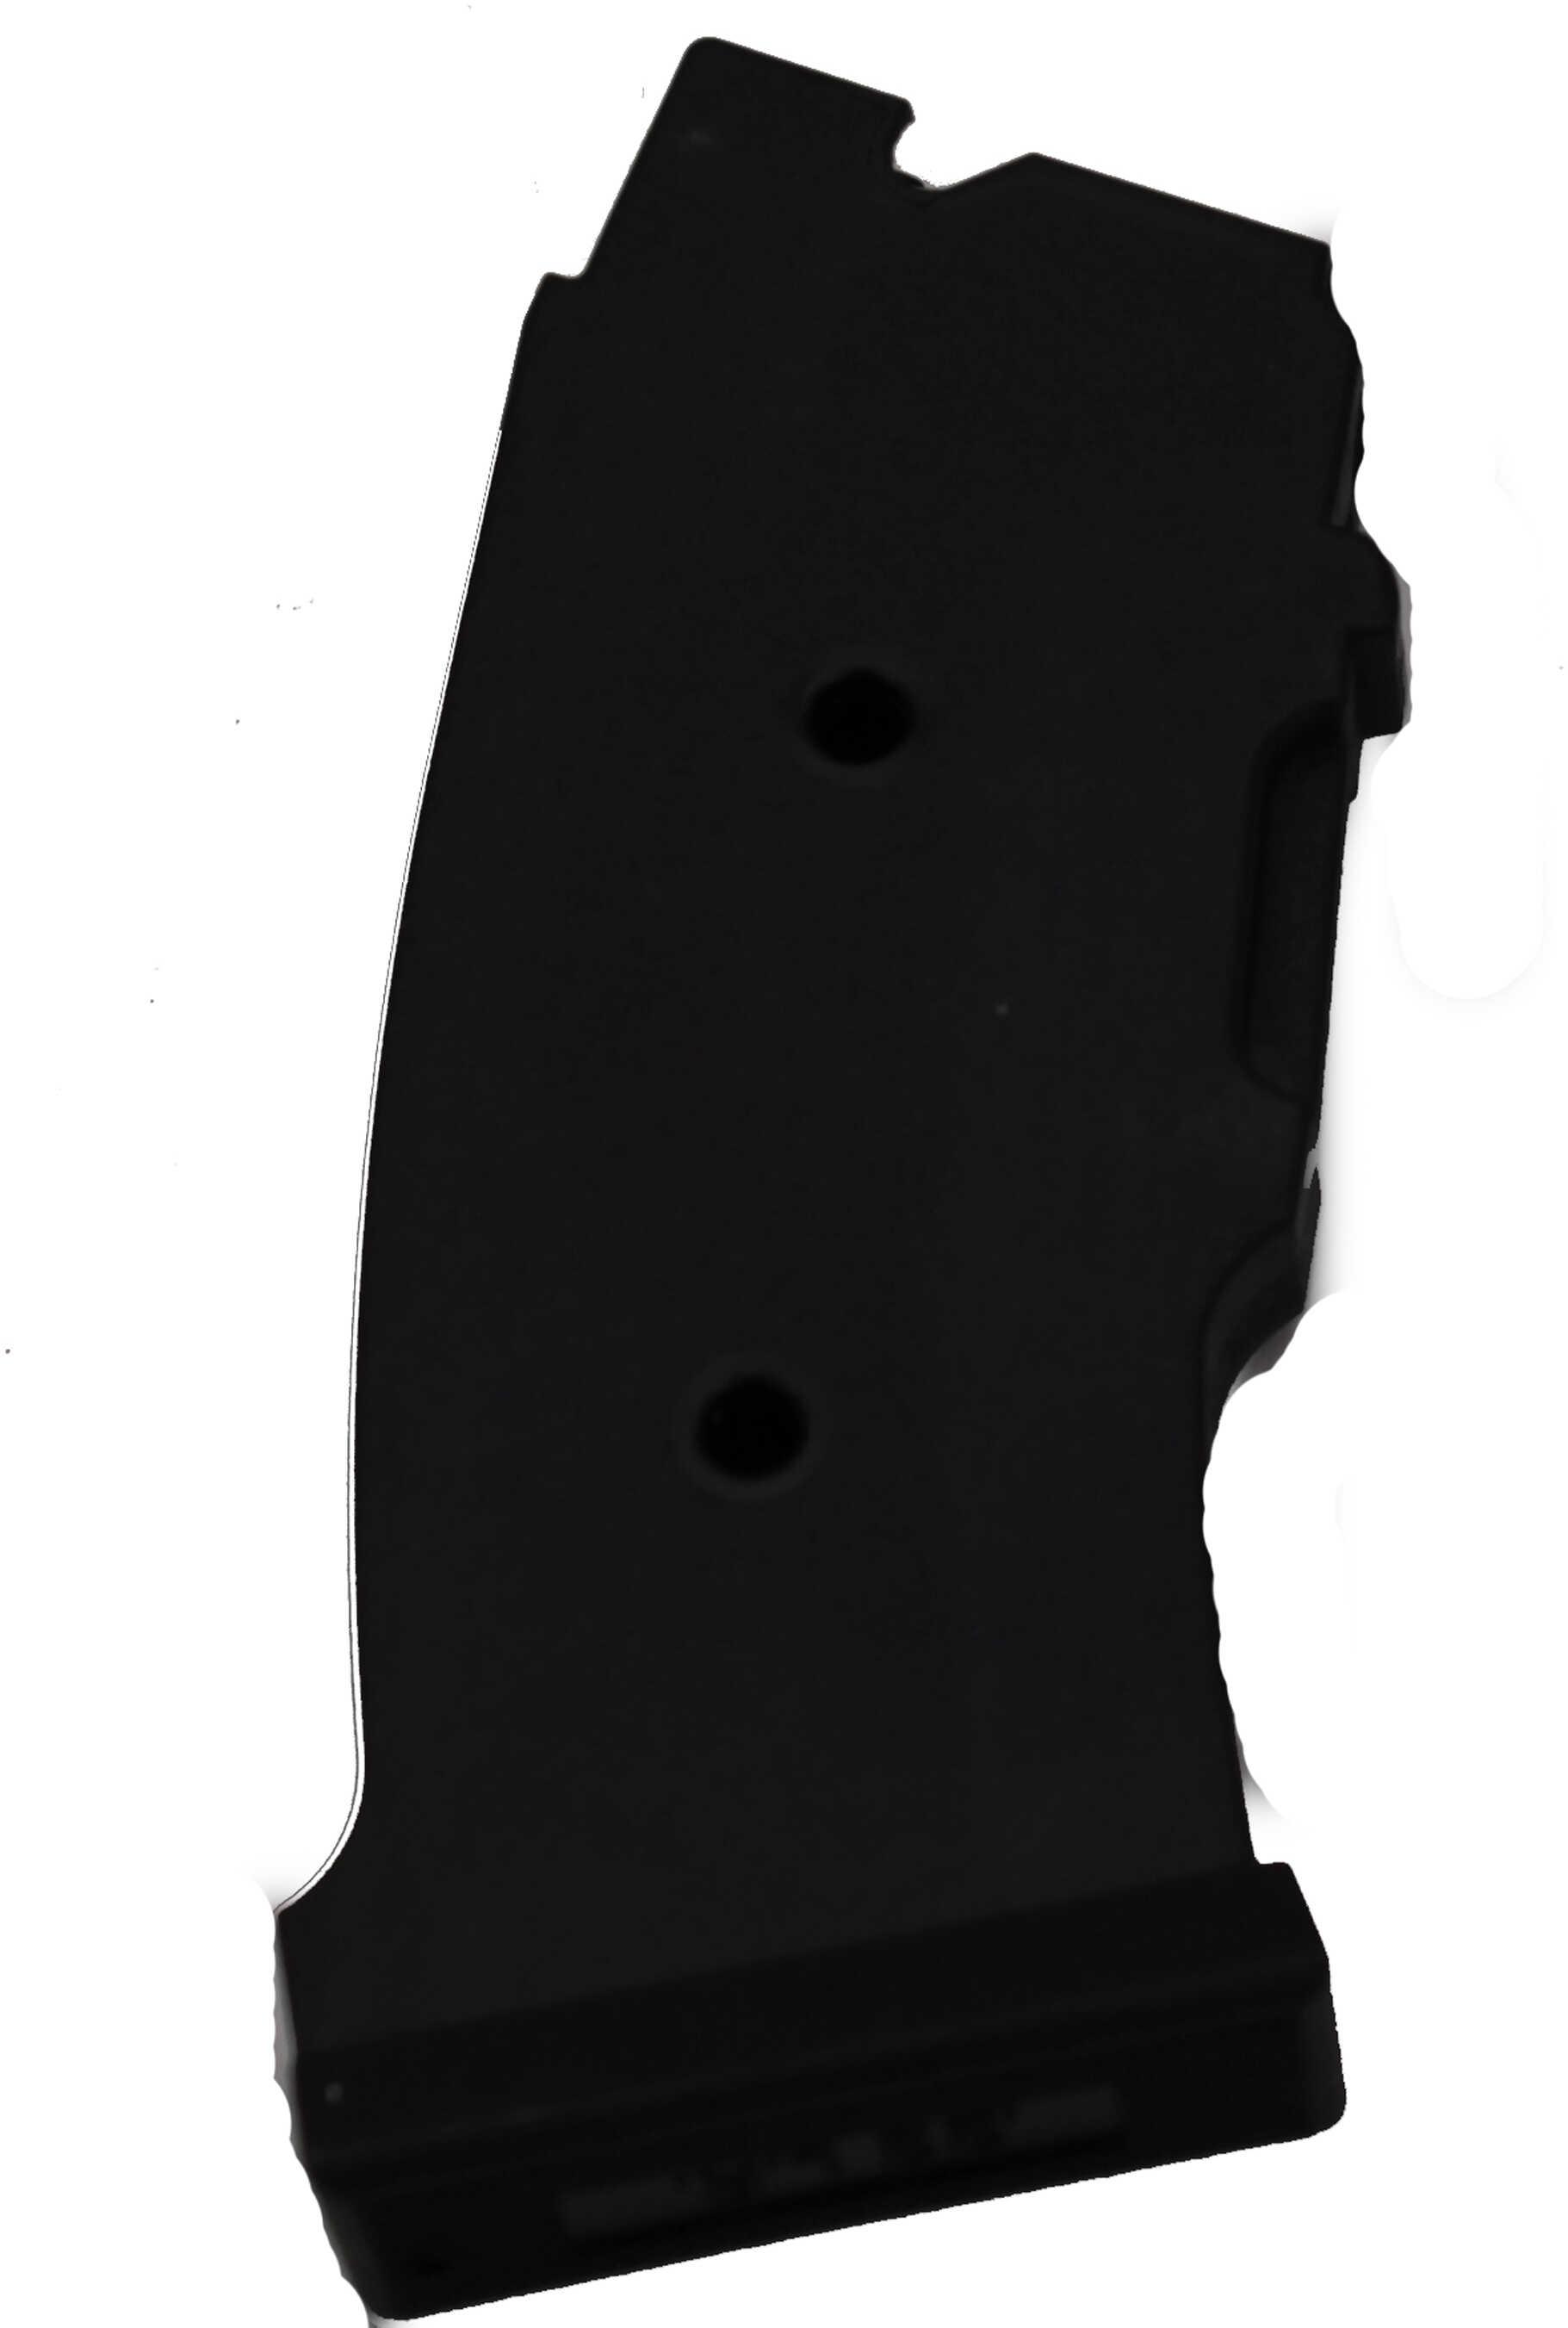 CZ Magazine 512 .22LR 10-ROUNDS Black Polymer